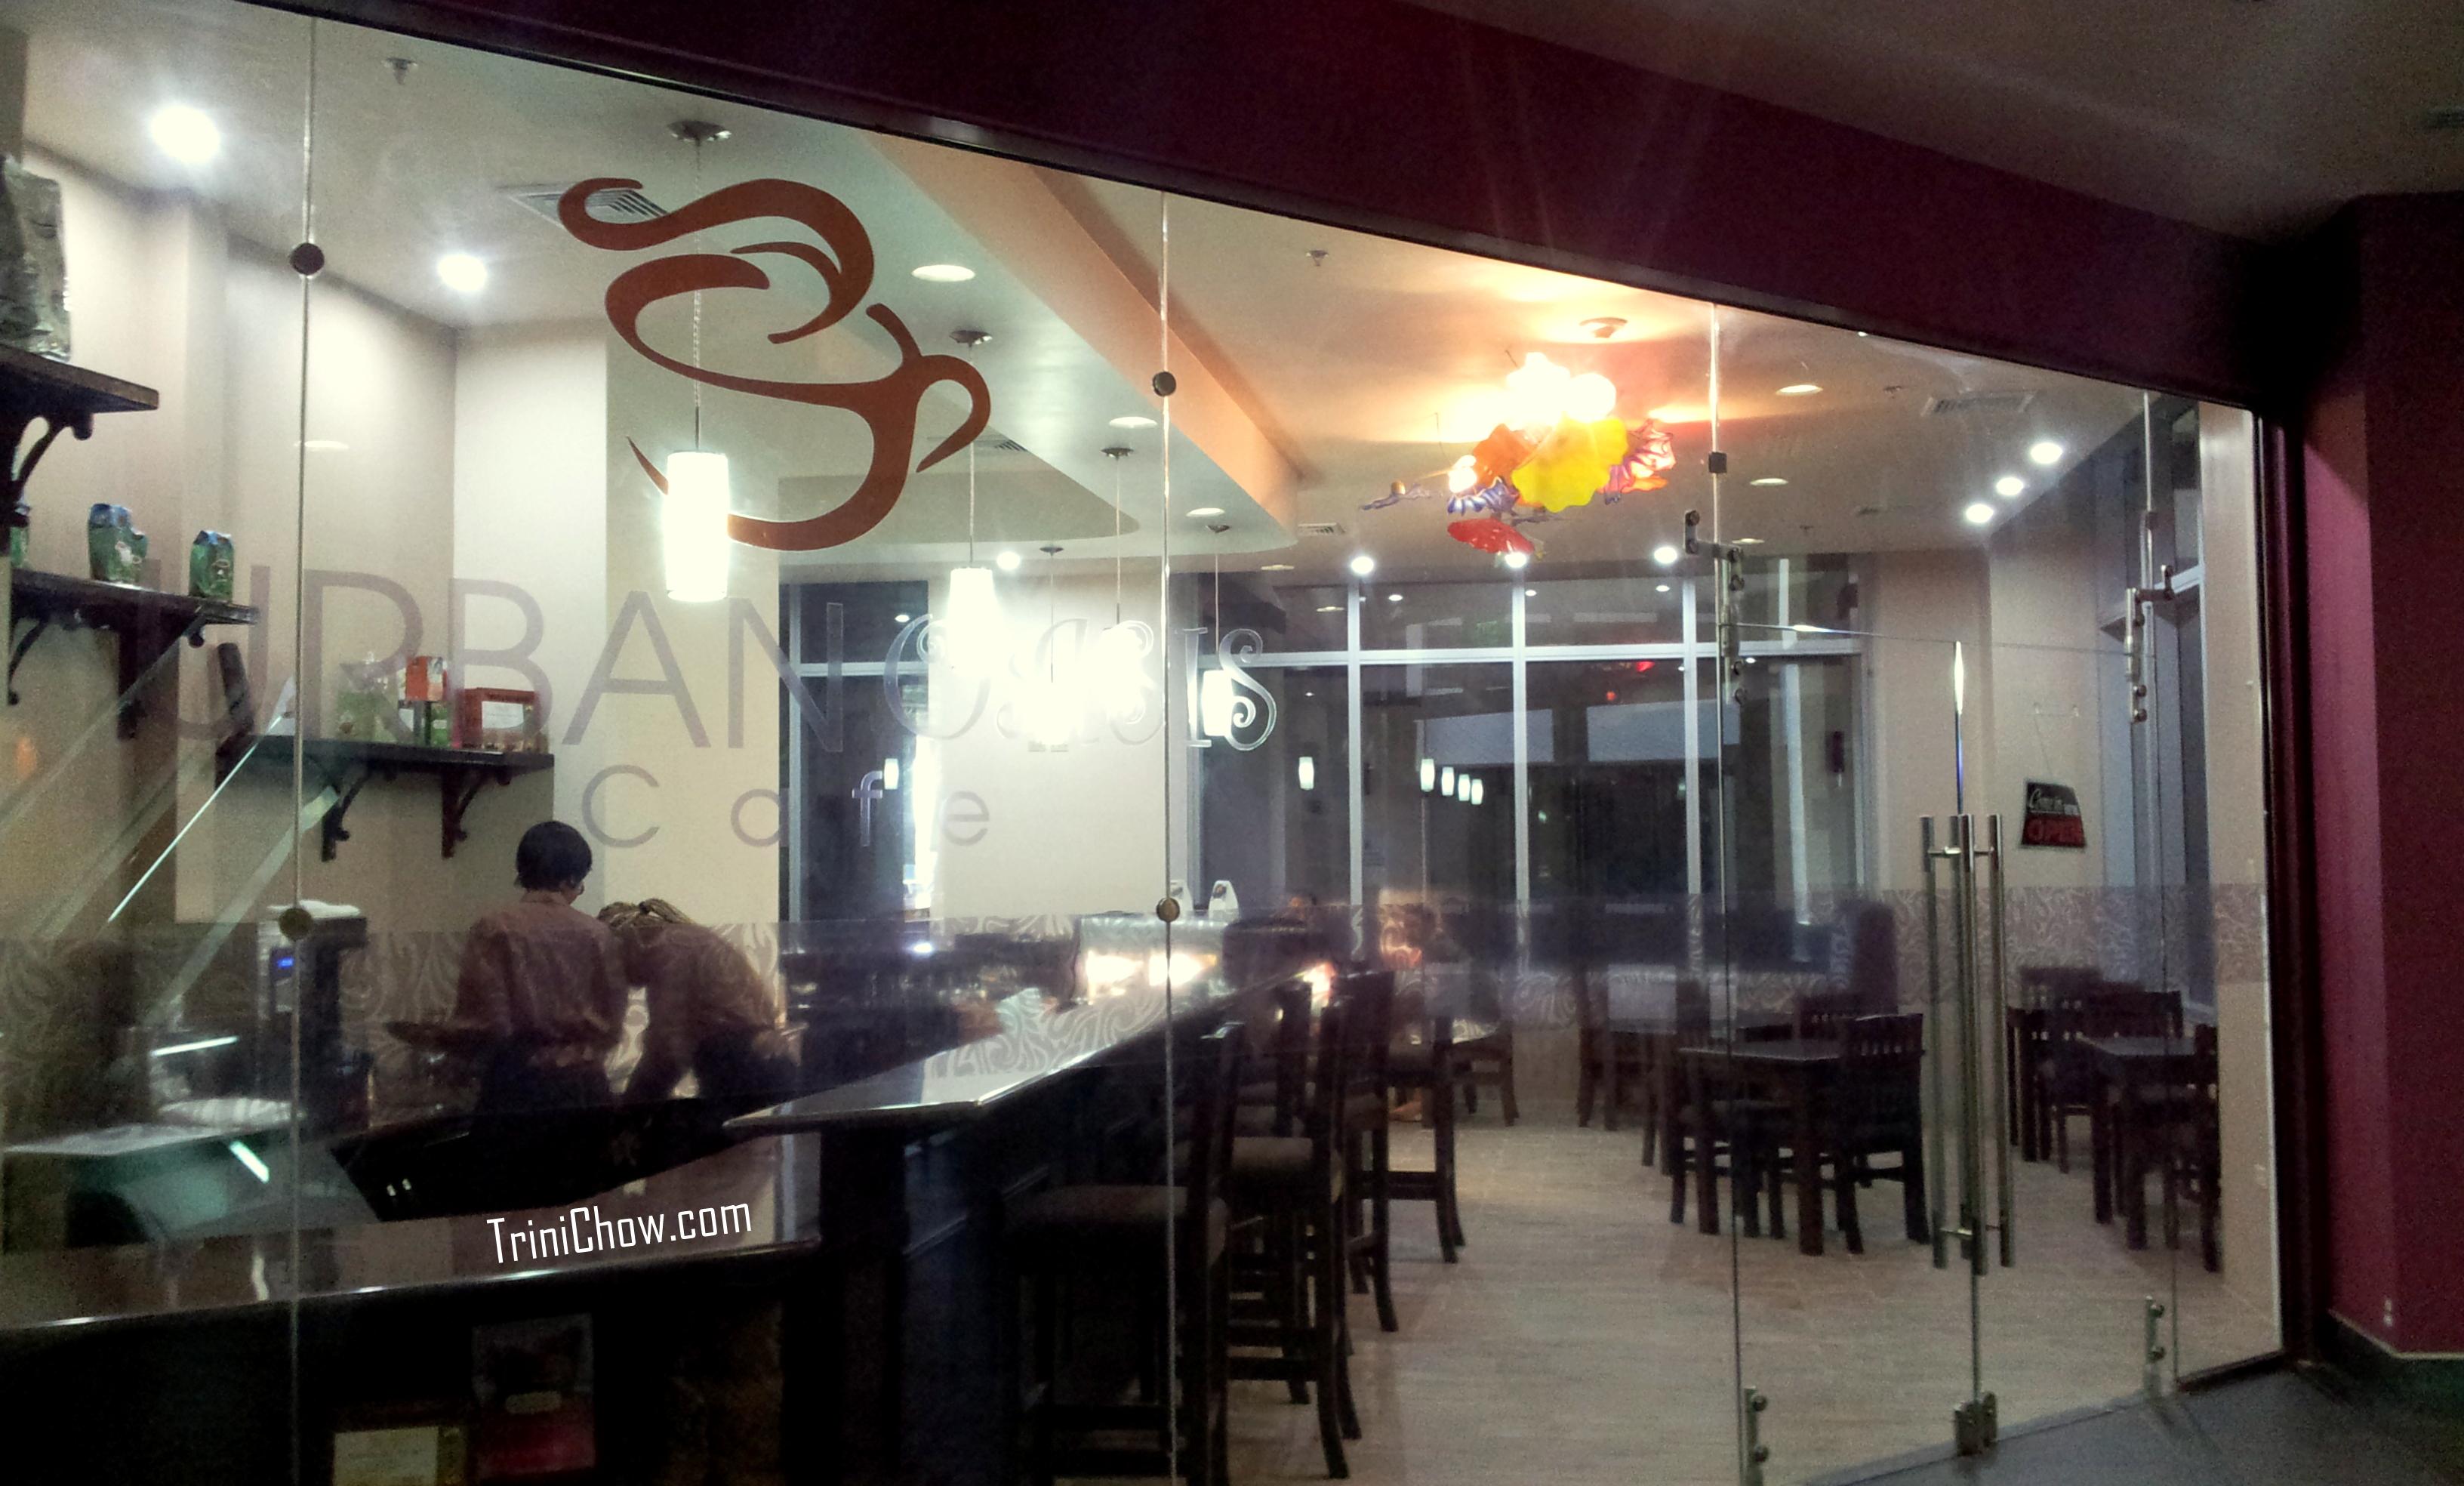 Urban Oasis Cafe Woodbrook Trinidad Trinichow